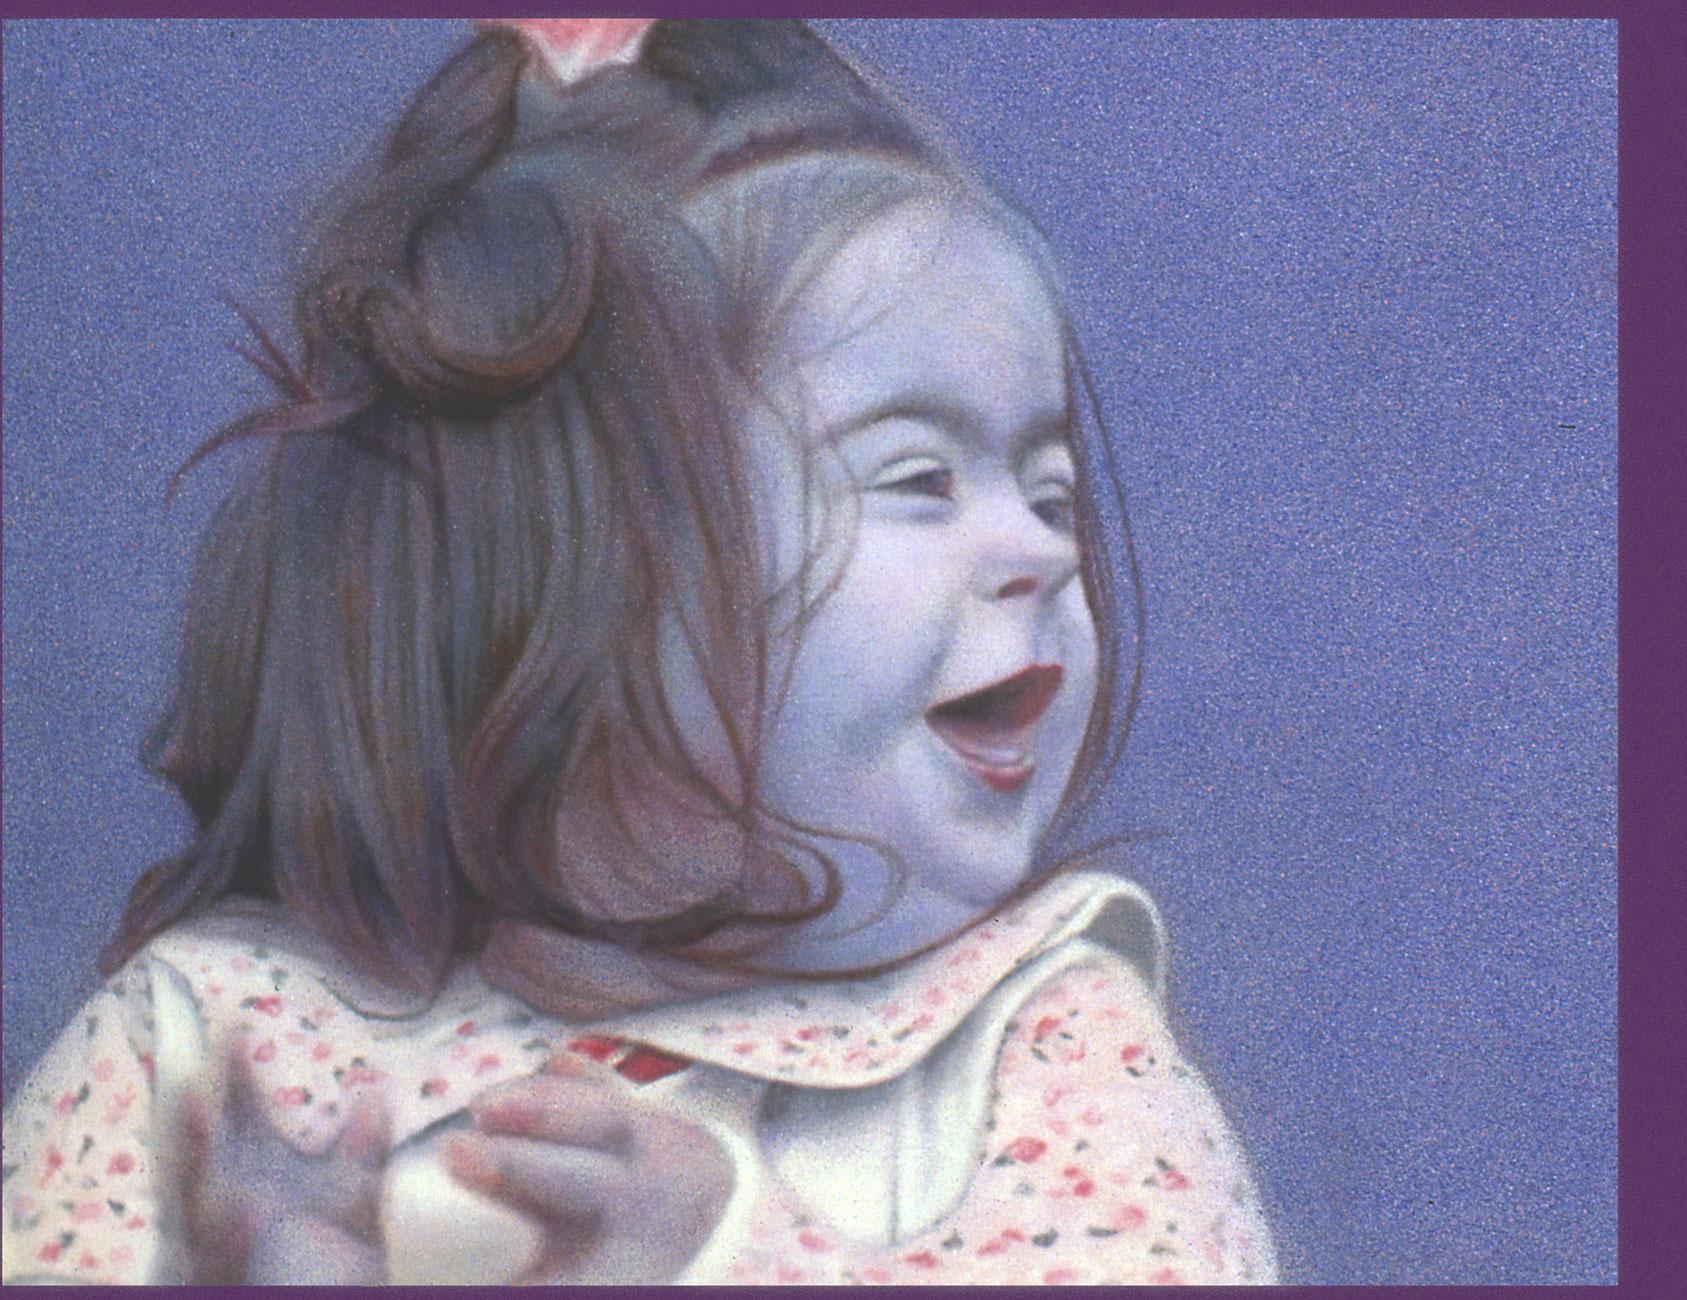 KATY (serie Syndrome), 2006